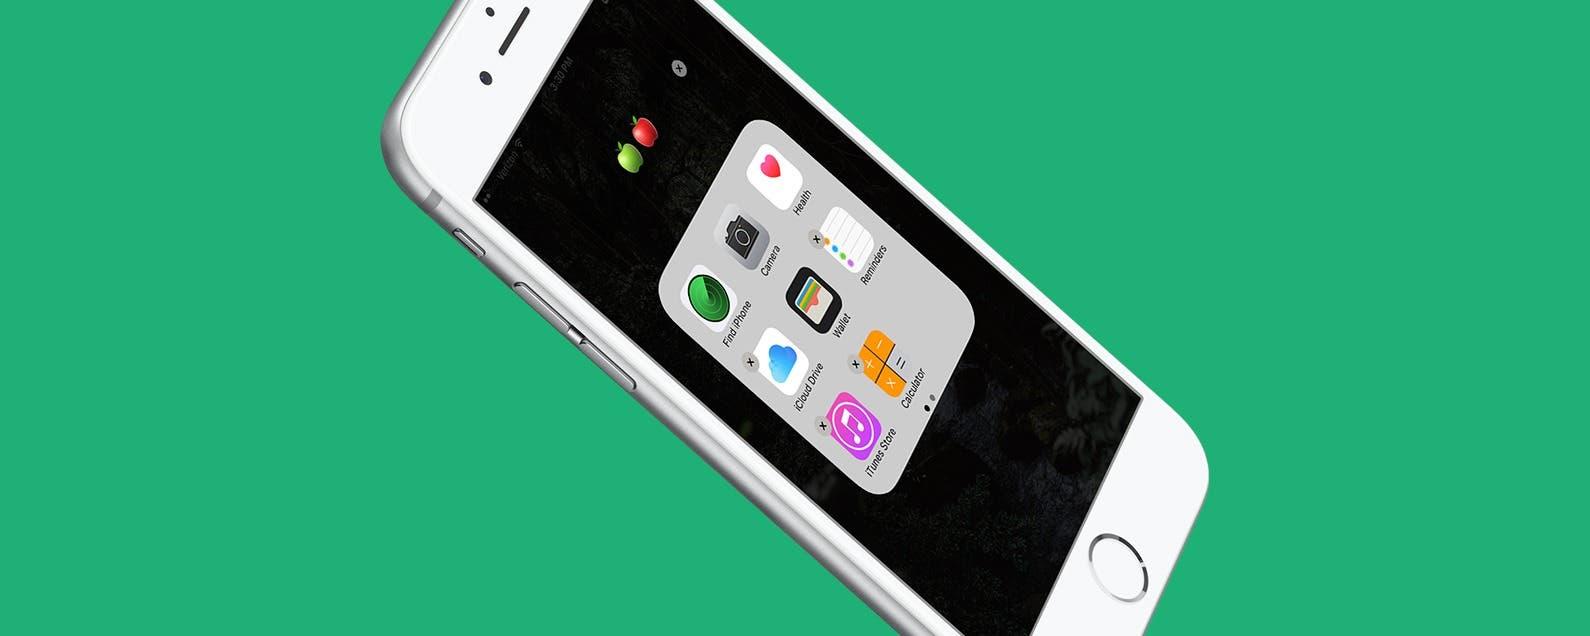 Calculator iphone for secret app 12 Cheating